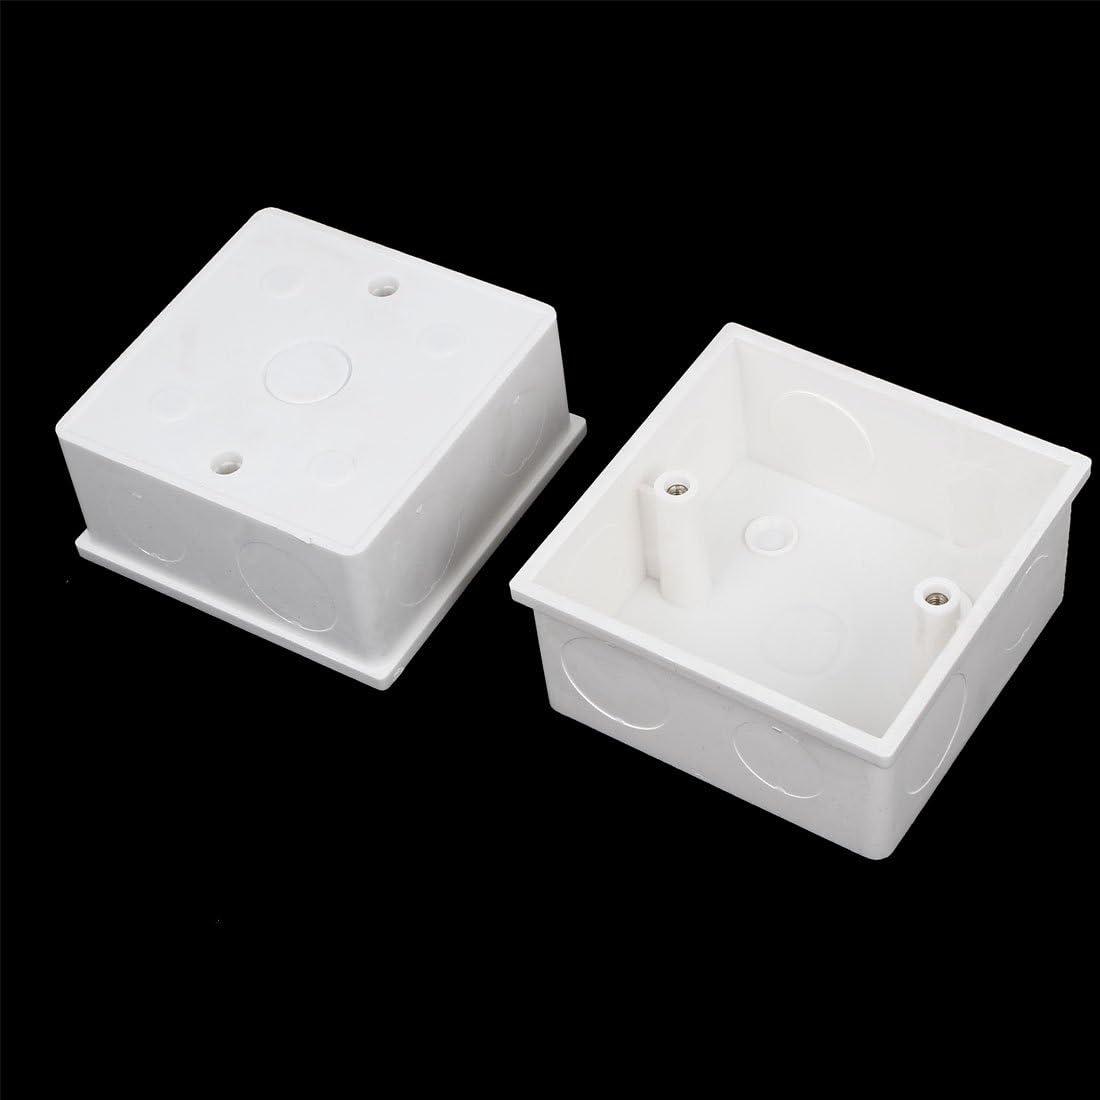 4 Piezas 86mmx86mmx43mm PVC blanco Soporte Caja Empotrar para ...